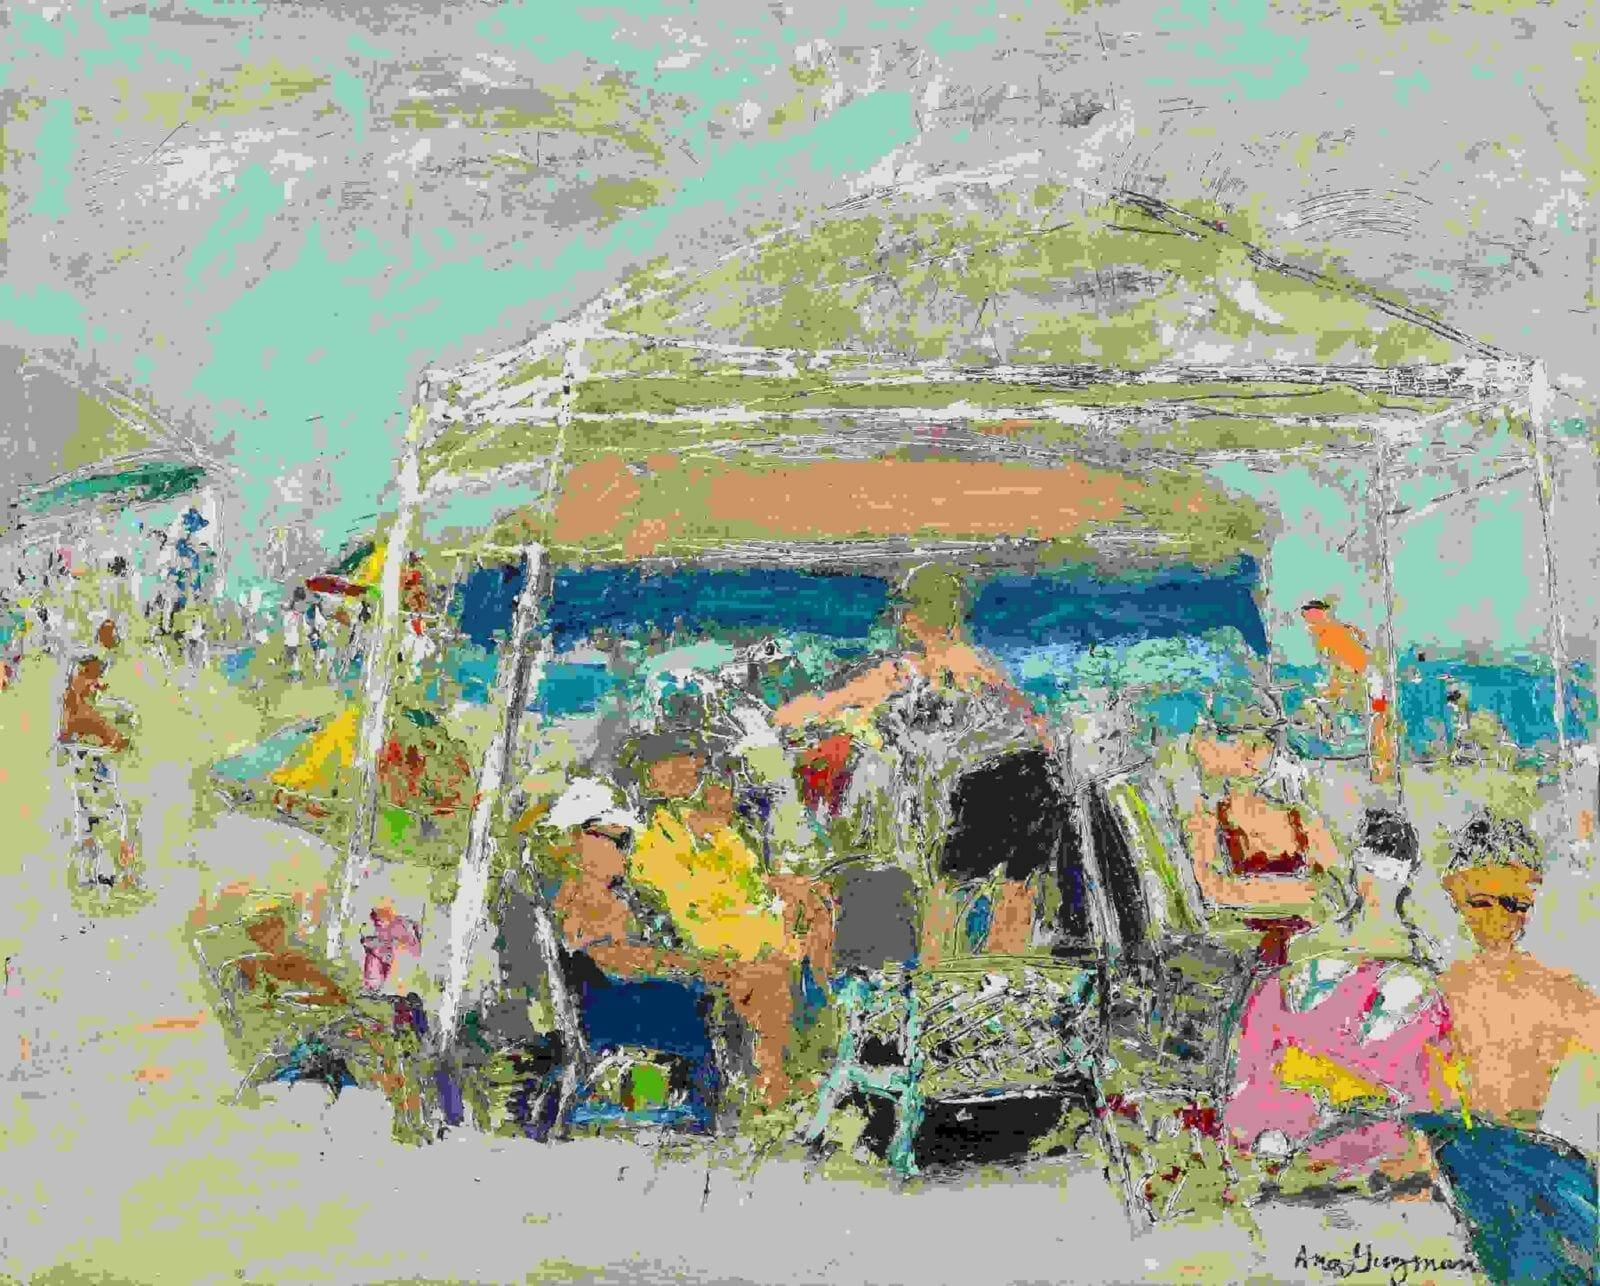 """A Day at the Beach"" by Ana Guzman"